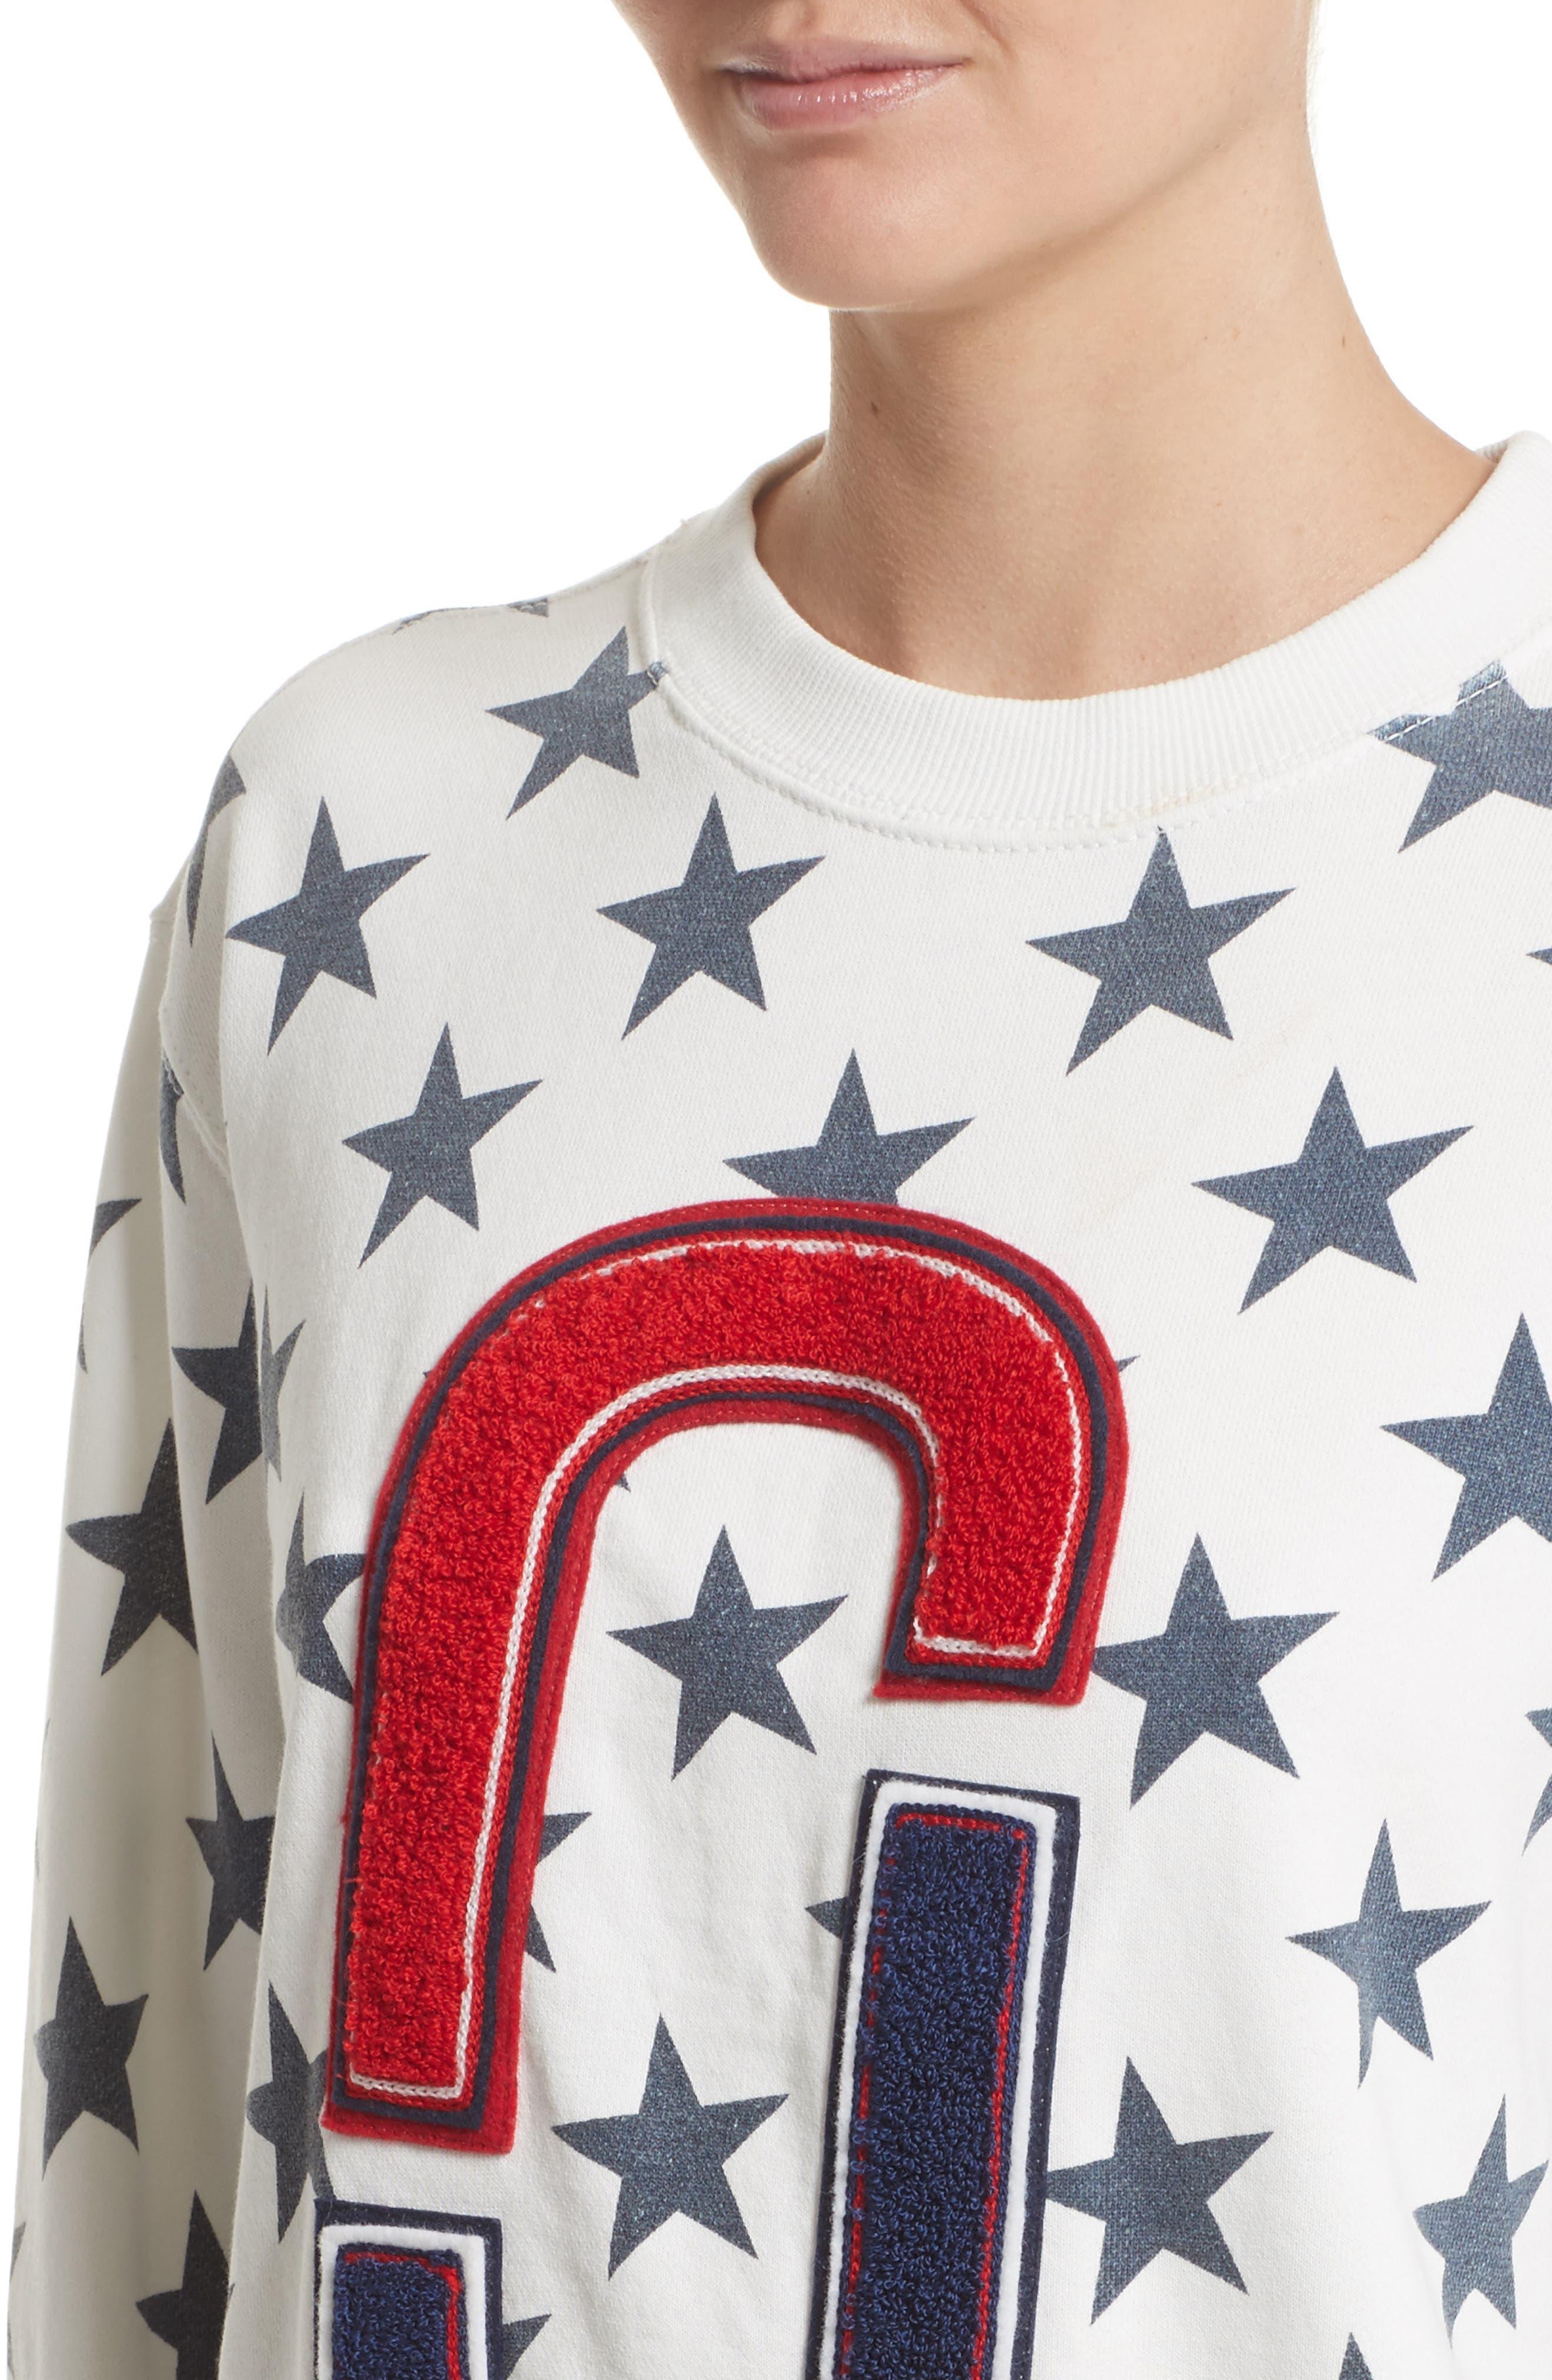 '90s Star Print Sweatshirt,                             Alternate thumbnail 6, color,                             Ivory Multi